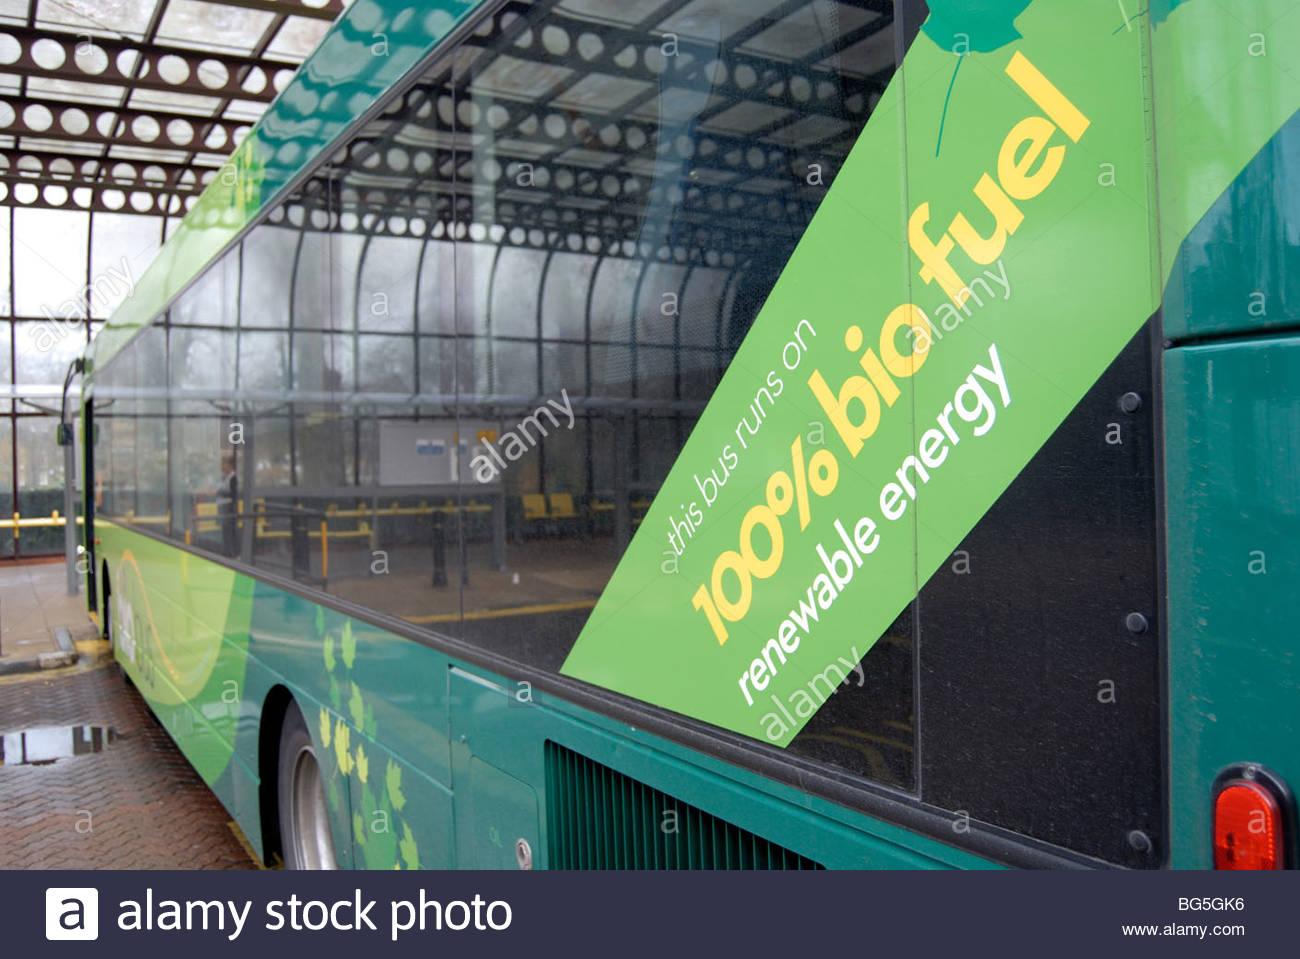 Cambridge UK 2009: Cambridge Bus Station. Stagecoach bus running on bio-fuel. - Stock Image